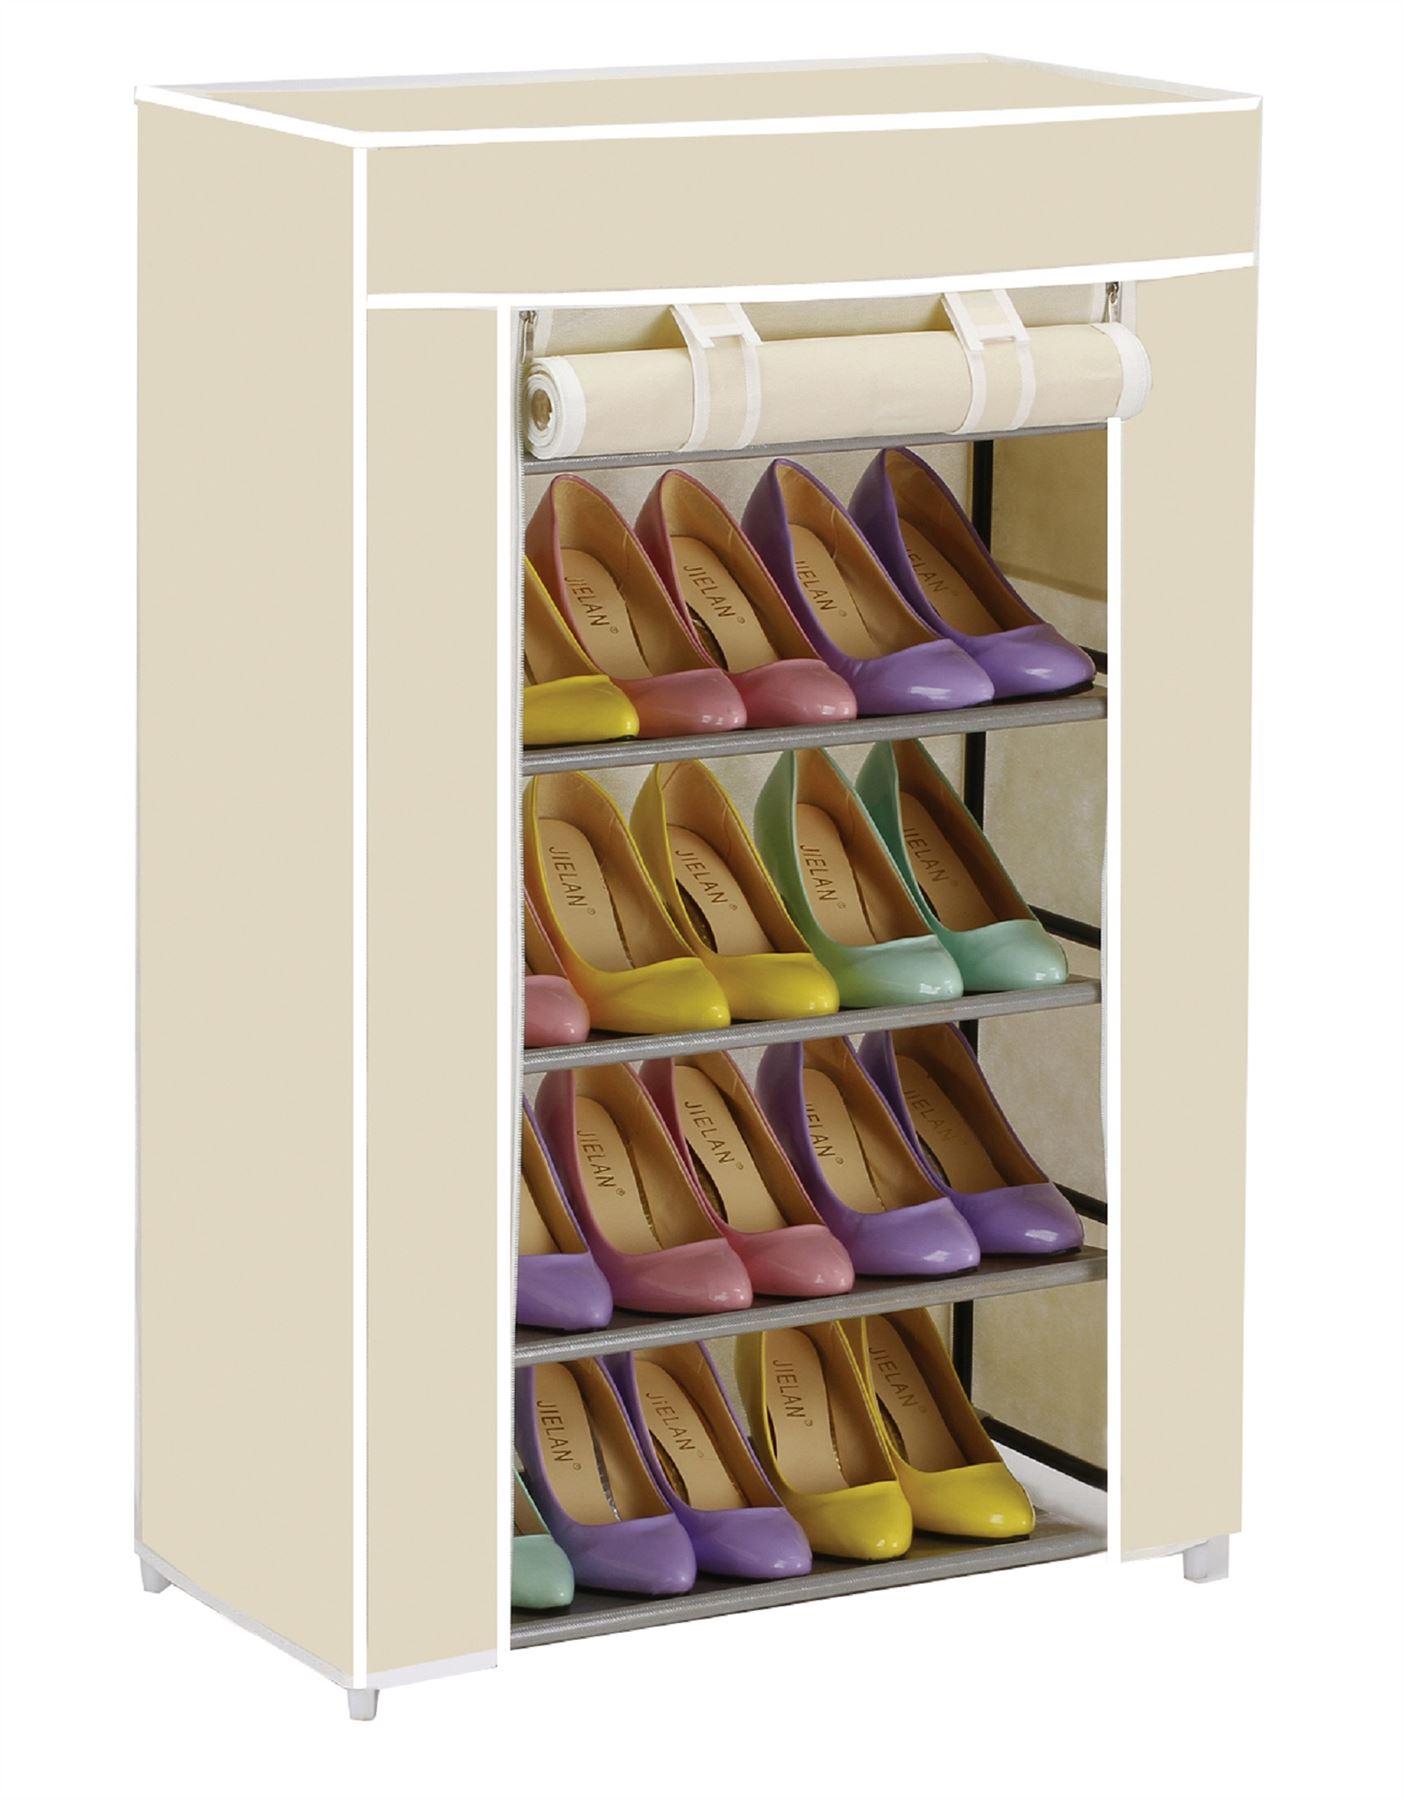 Vinsani 5 nivel Organizador De Lona Zapato Rack Rack sostiene hasta 15 Pares